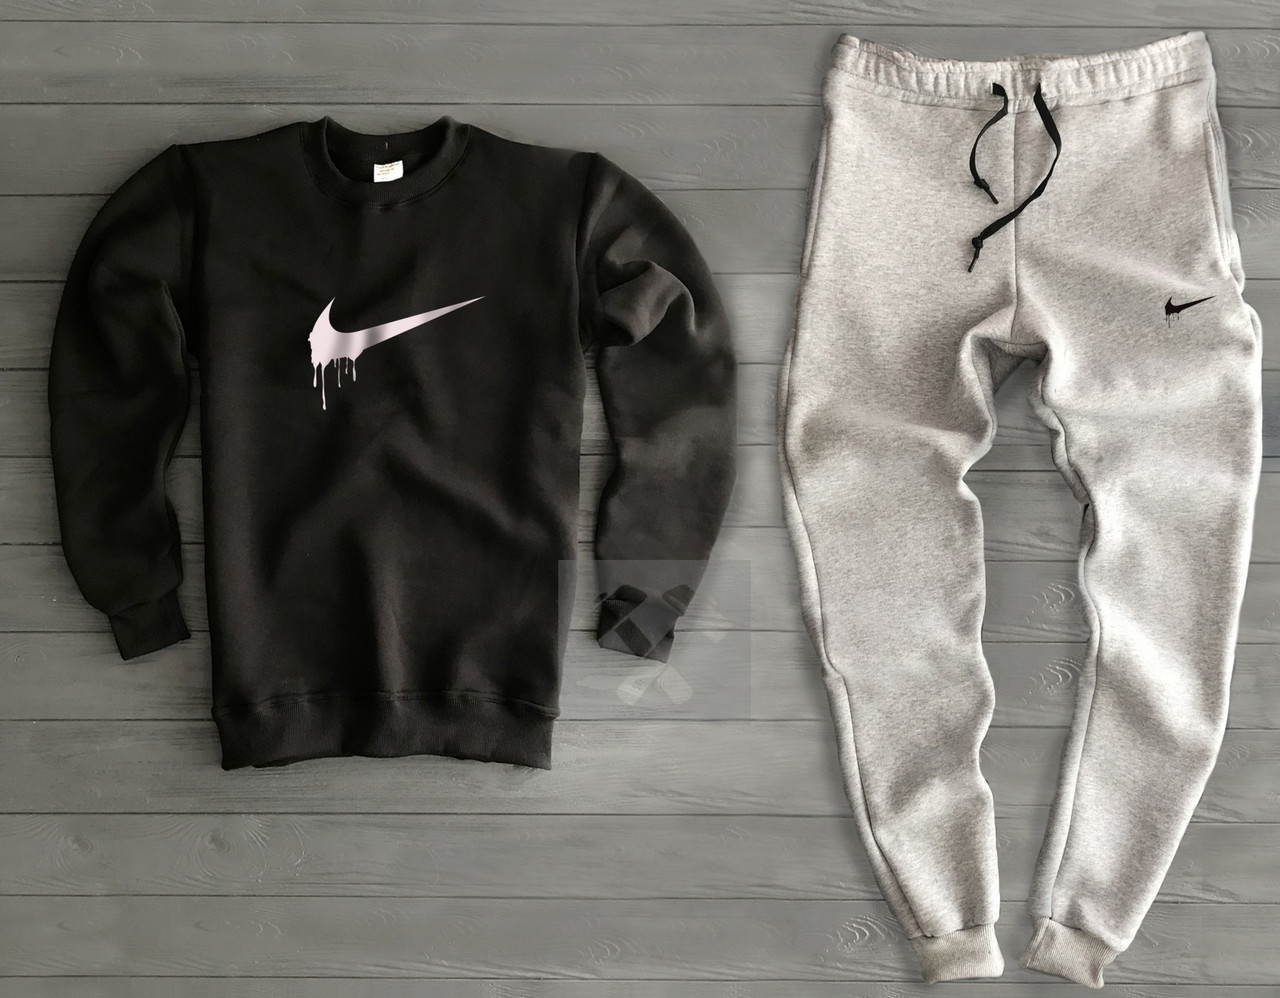 2ae86ed6 Мужской теплый черно серый спортивный костюм Nike Найк (РЕПЛИКА) -  интернет-магазин «